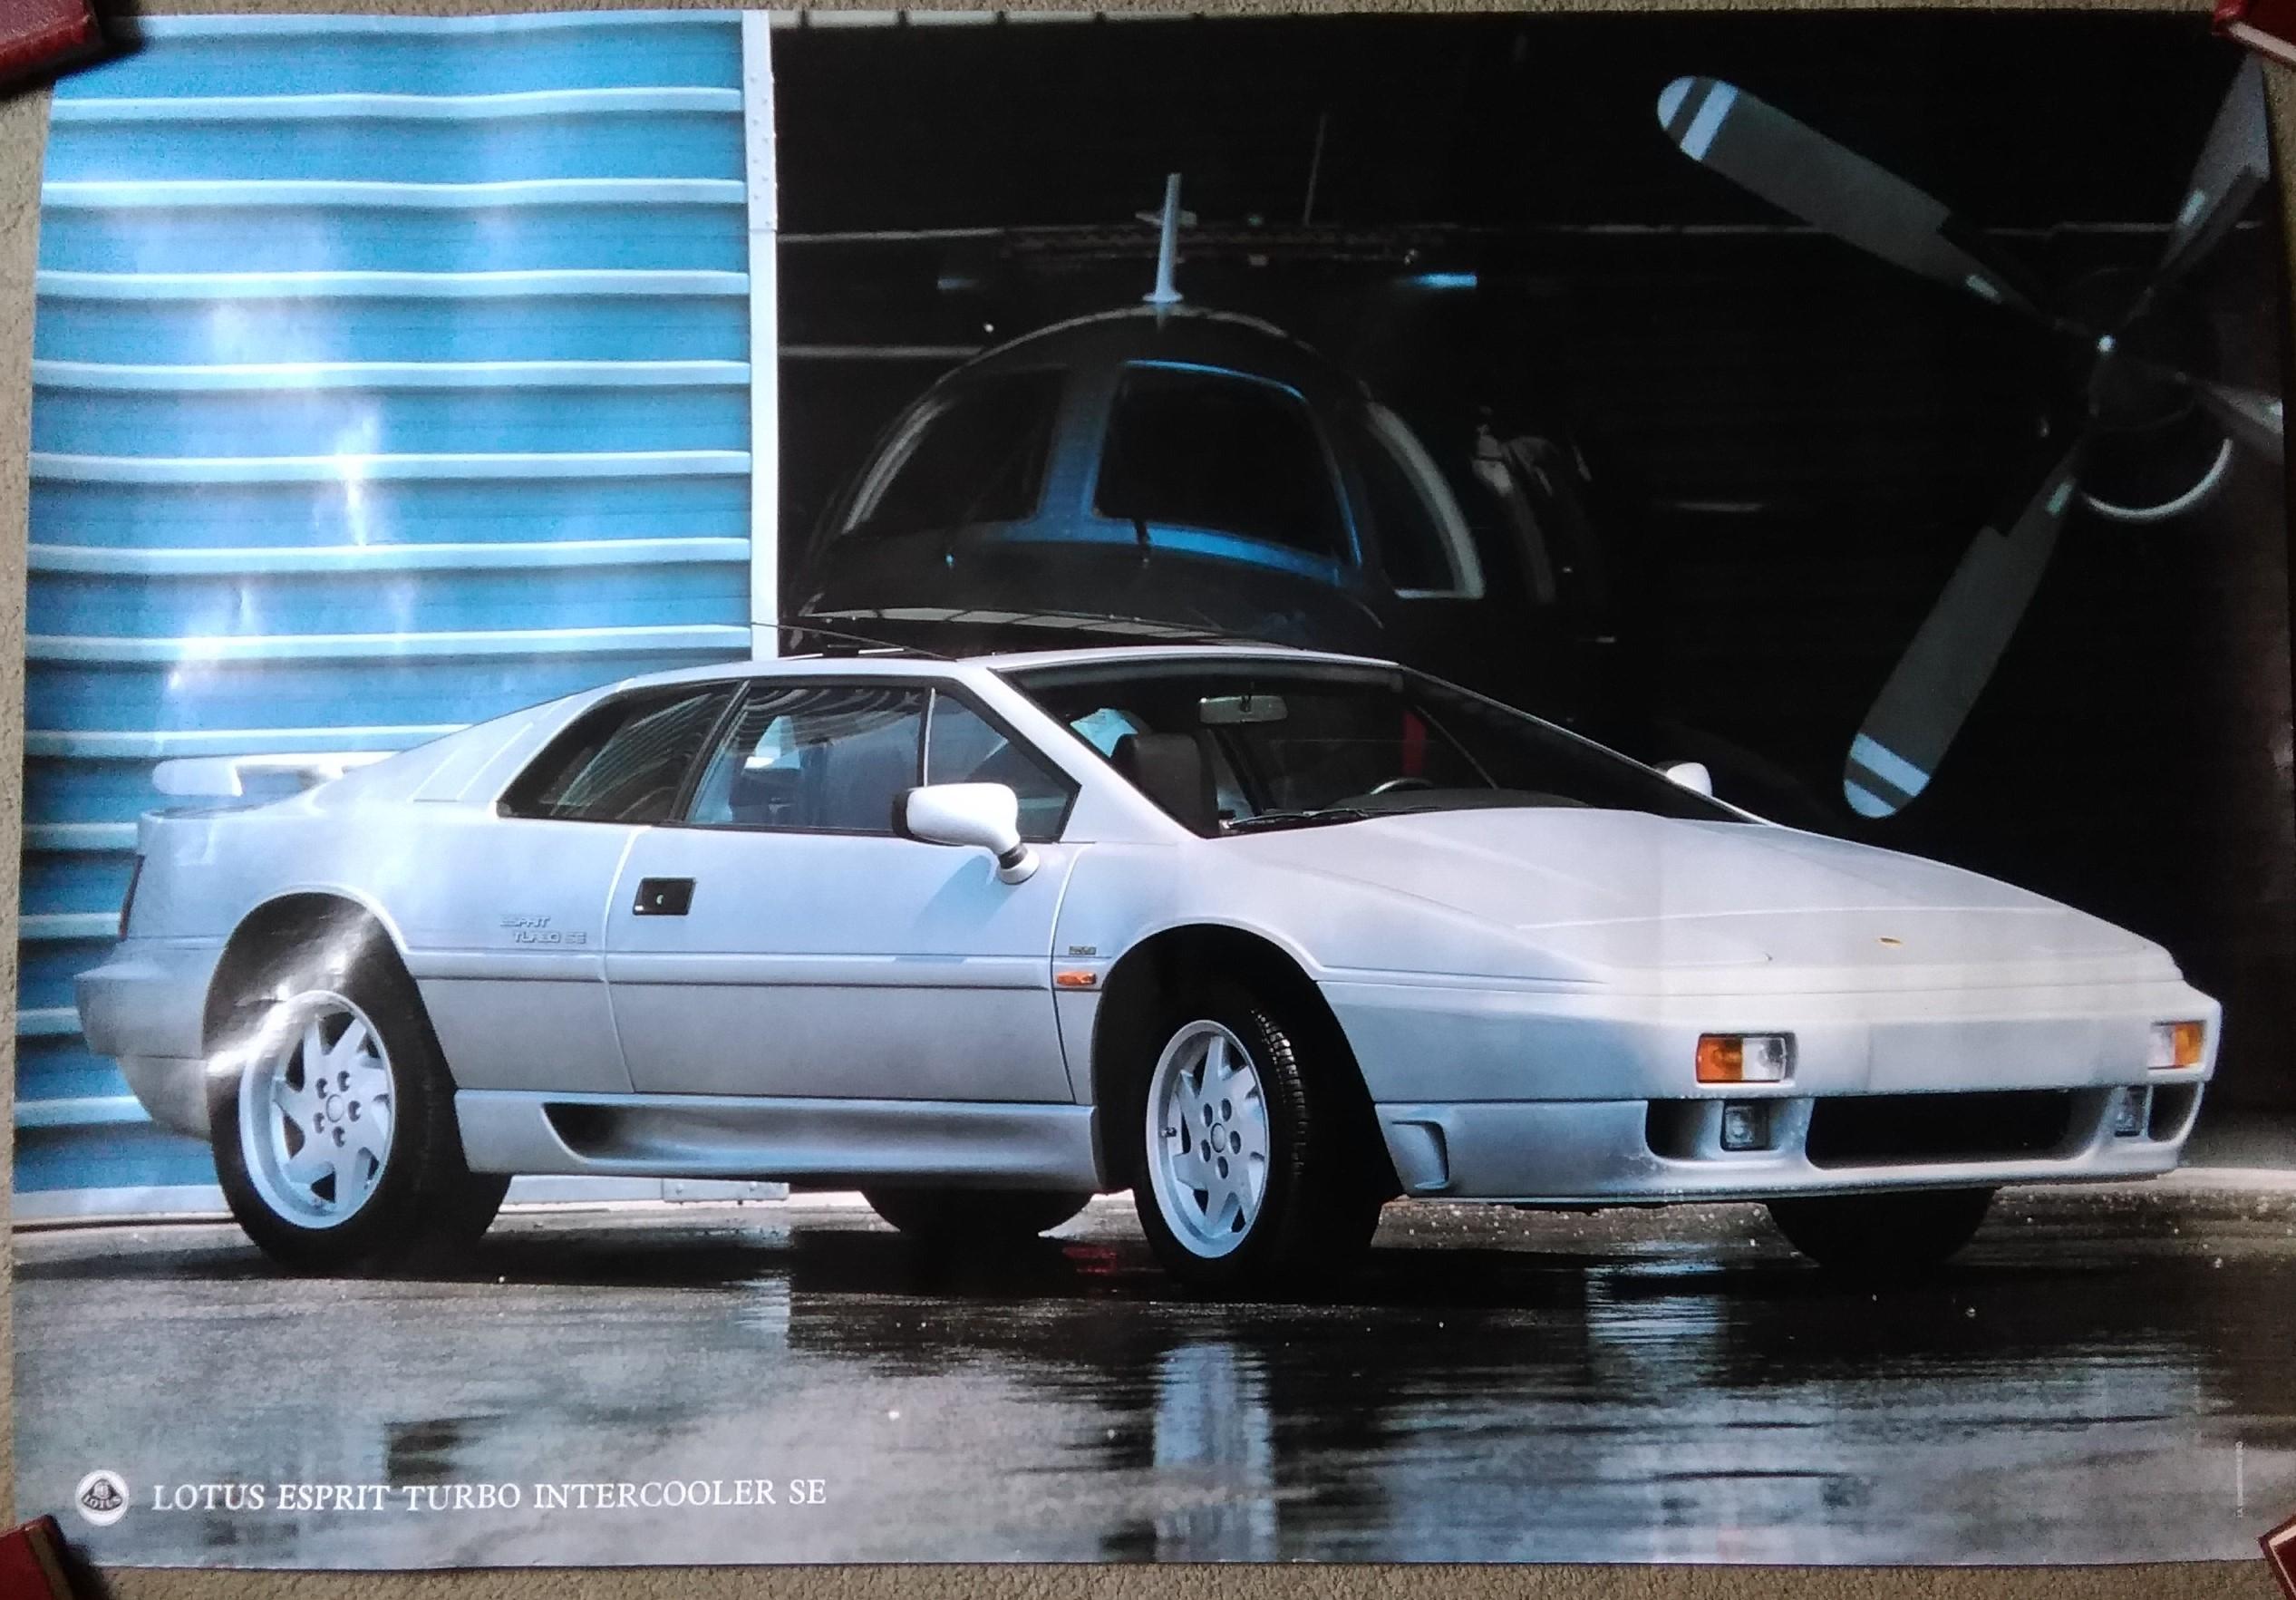 Lotus Esprit Turbo Intercooler SE Poster